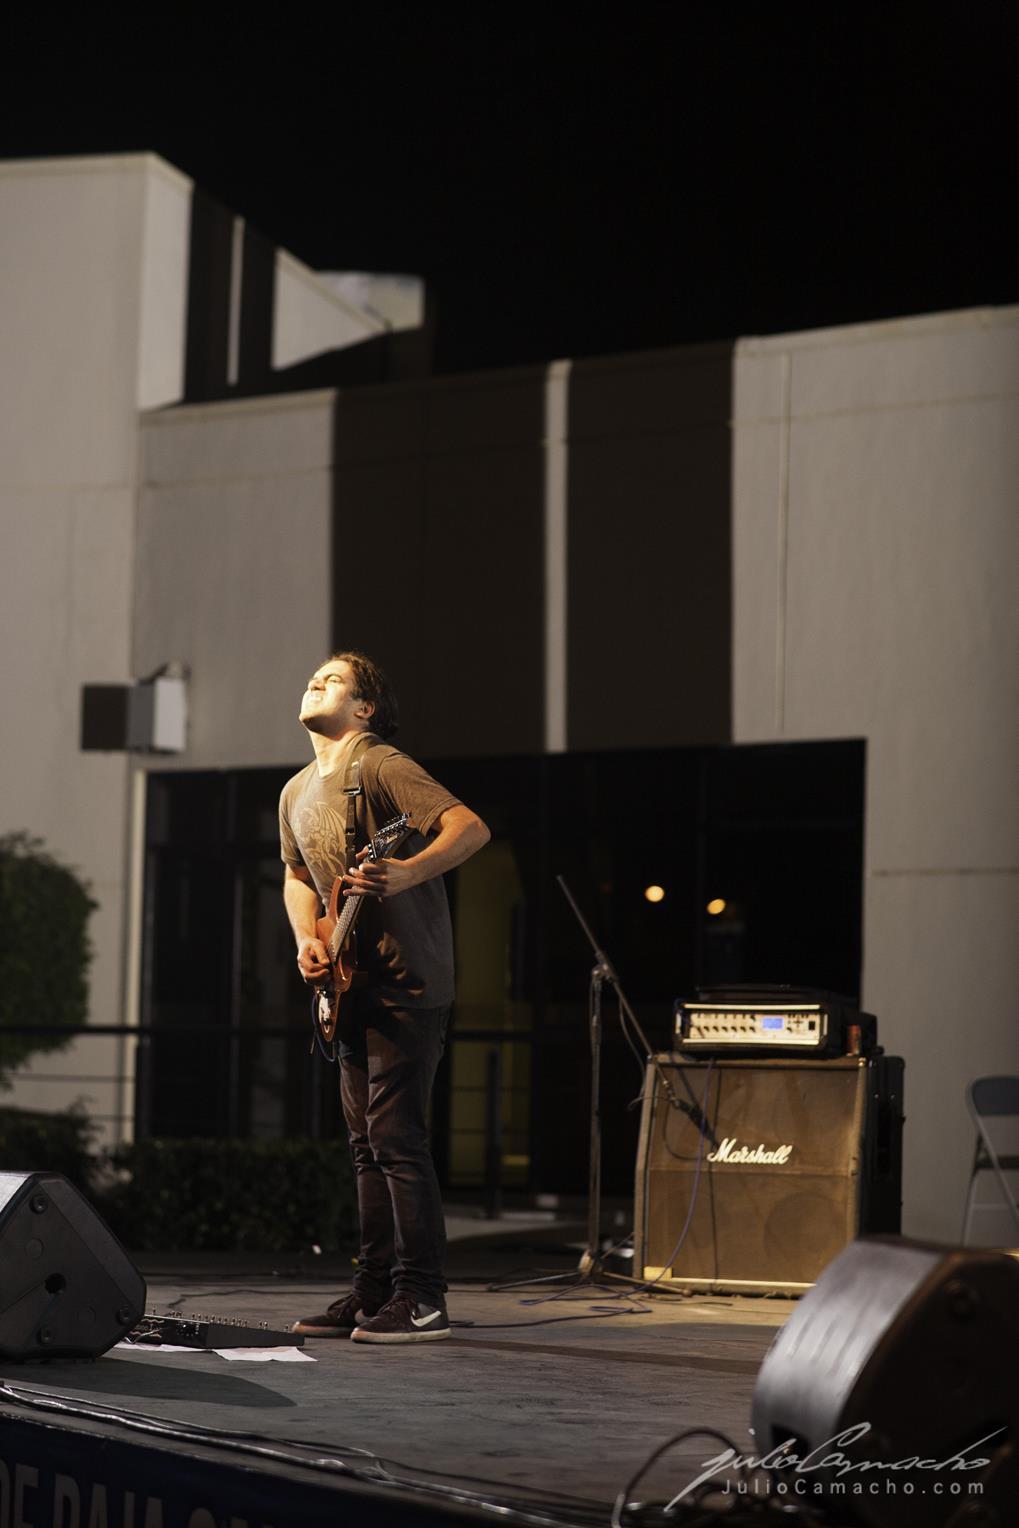 2014-10-30 31 CAST TOUR Ensenada y Tijuana - 0884 - www.Juli (Copy).jpg